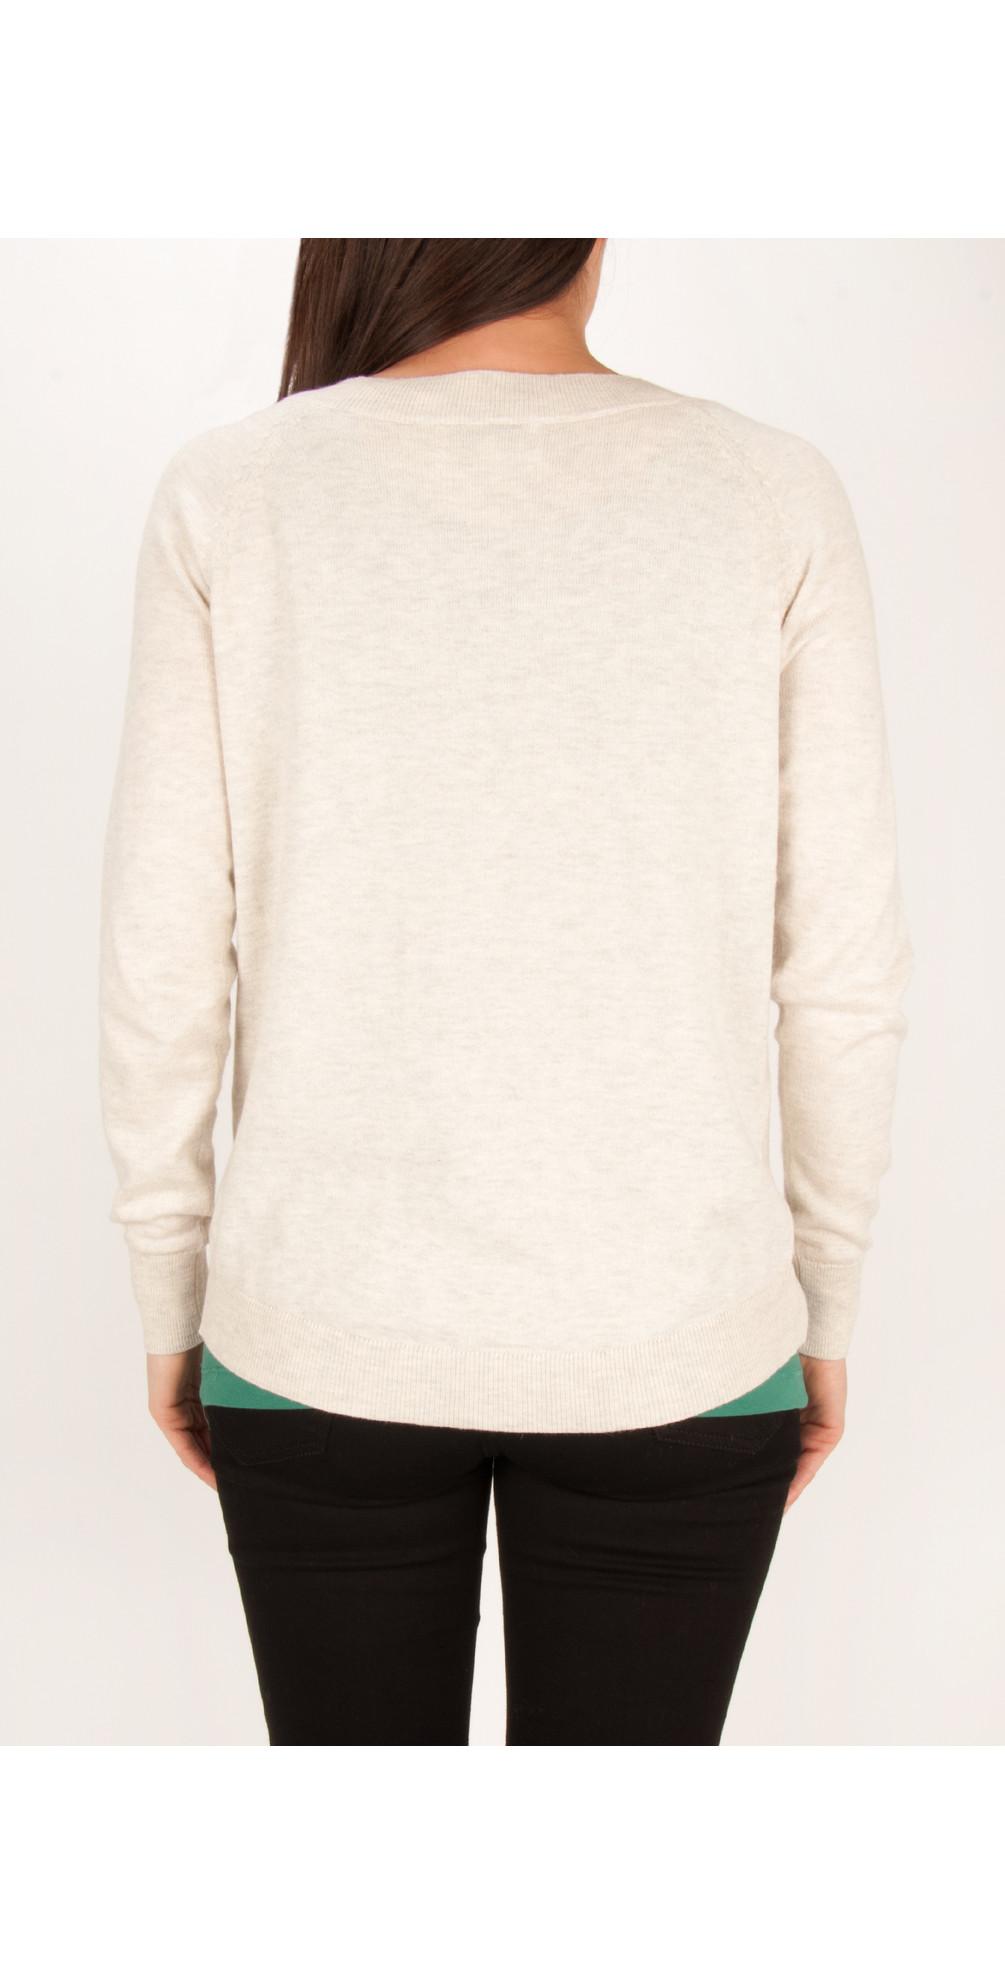 Cotton Alpaca Lightweight Pullover main image